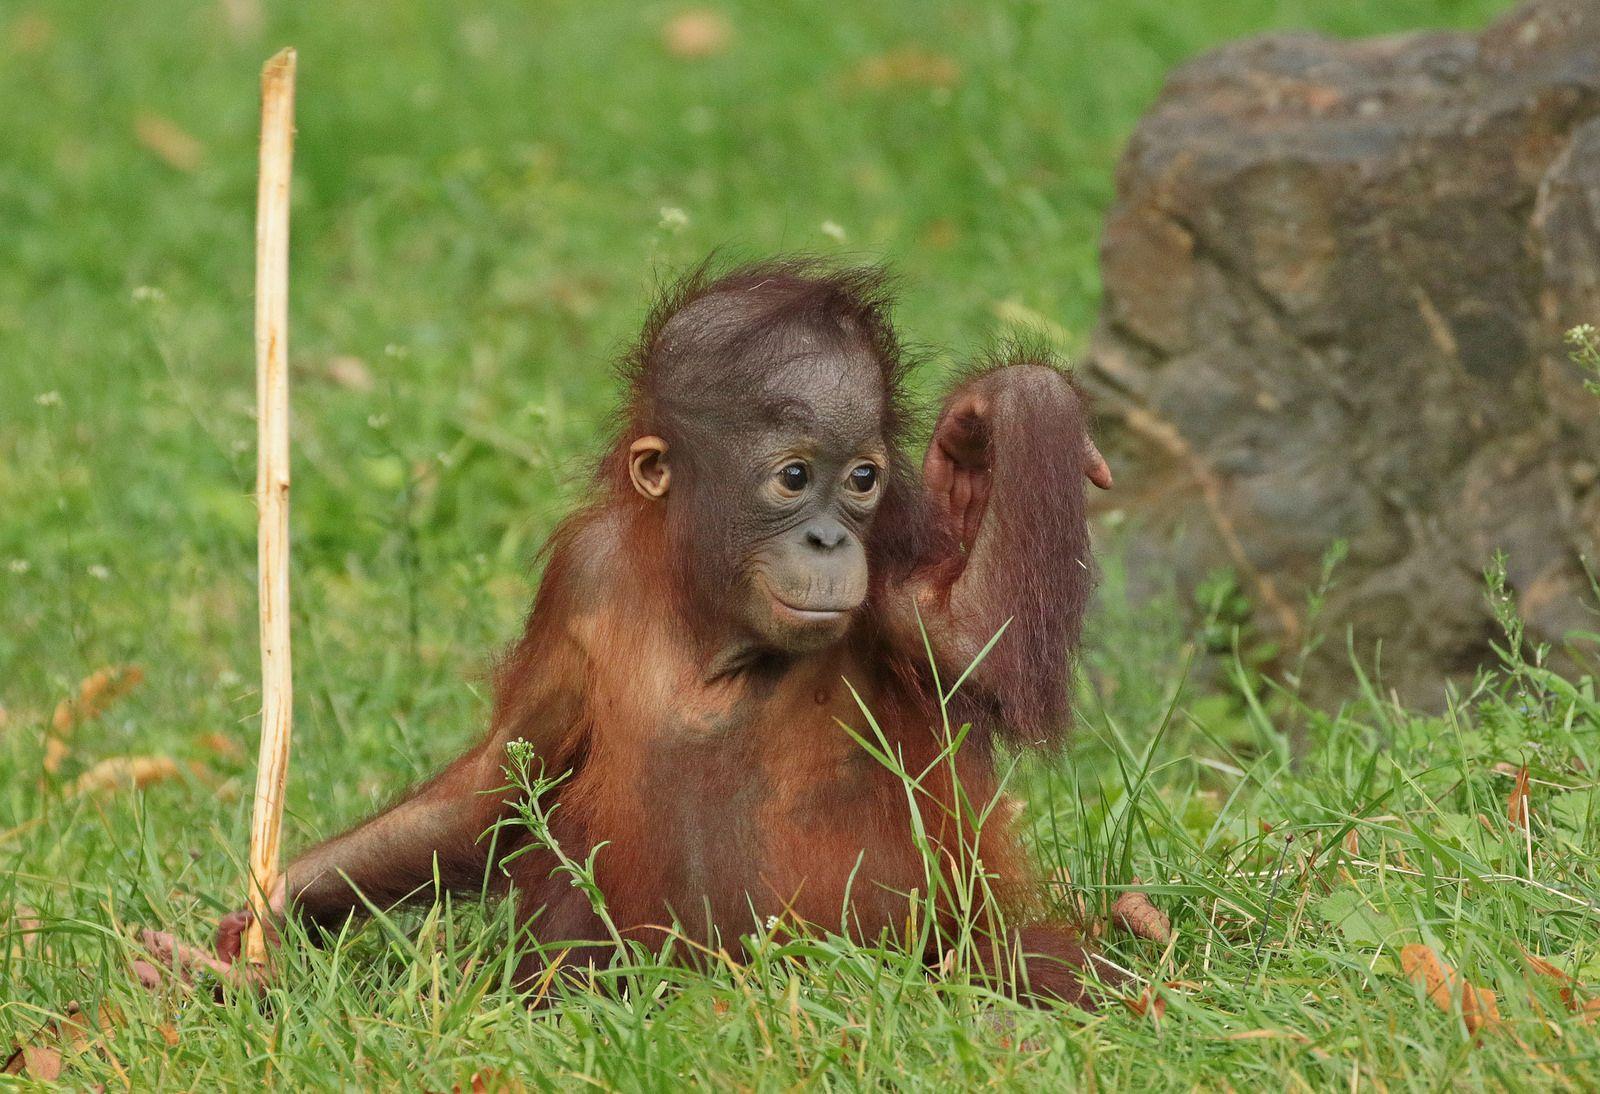 Sumatran Orangutan Sabbar Ouwehands Bb2a2748 Sumatran Orangutan Orangutan Baby Orangutan